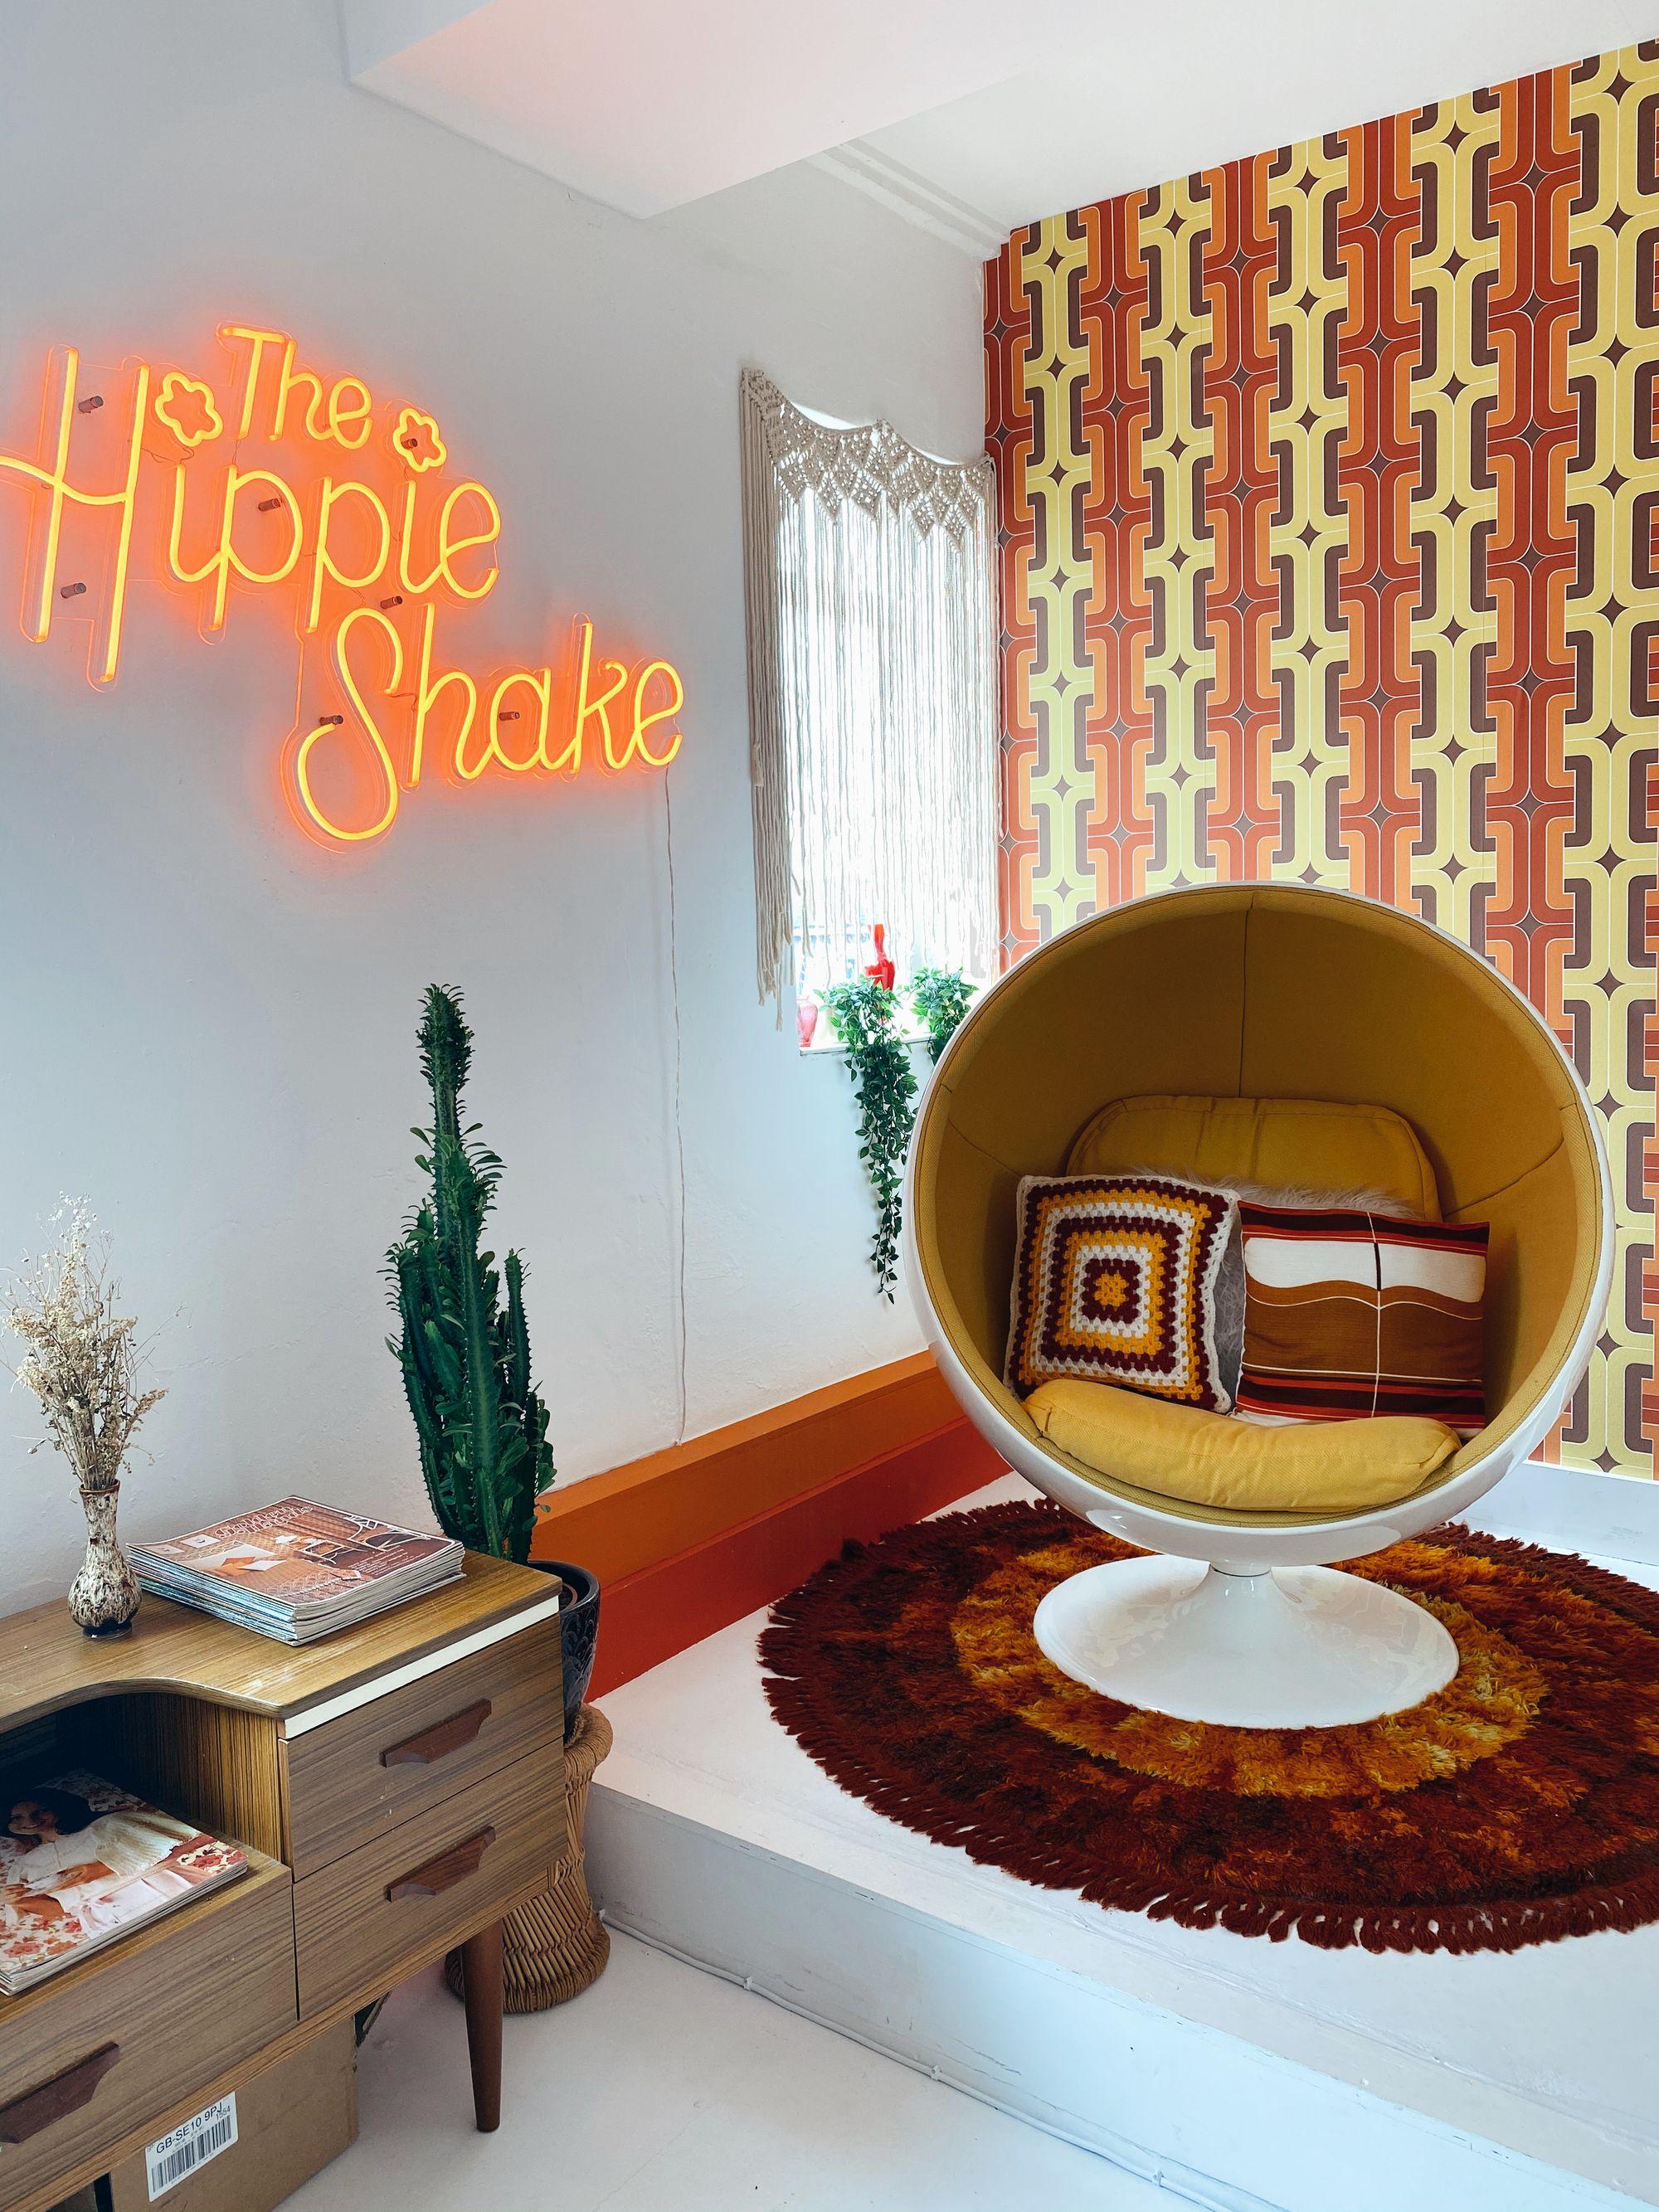 60s Neon Sign Vintage in 2020 Bedroom decor design, Room